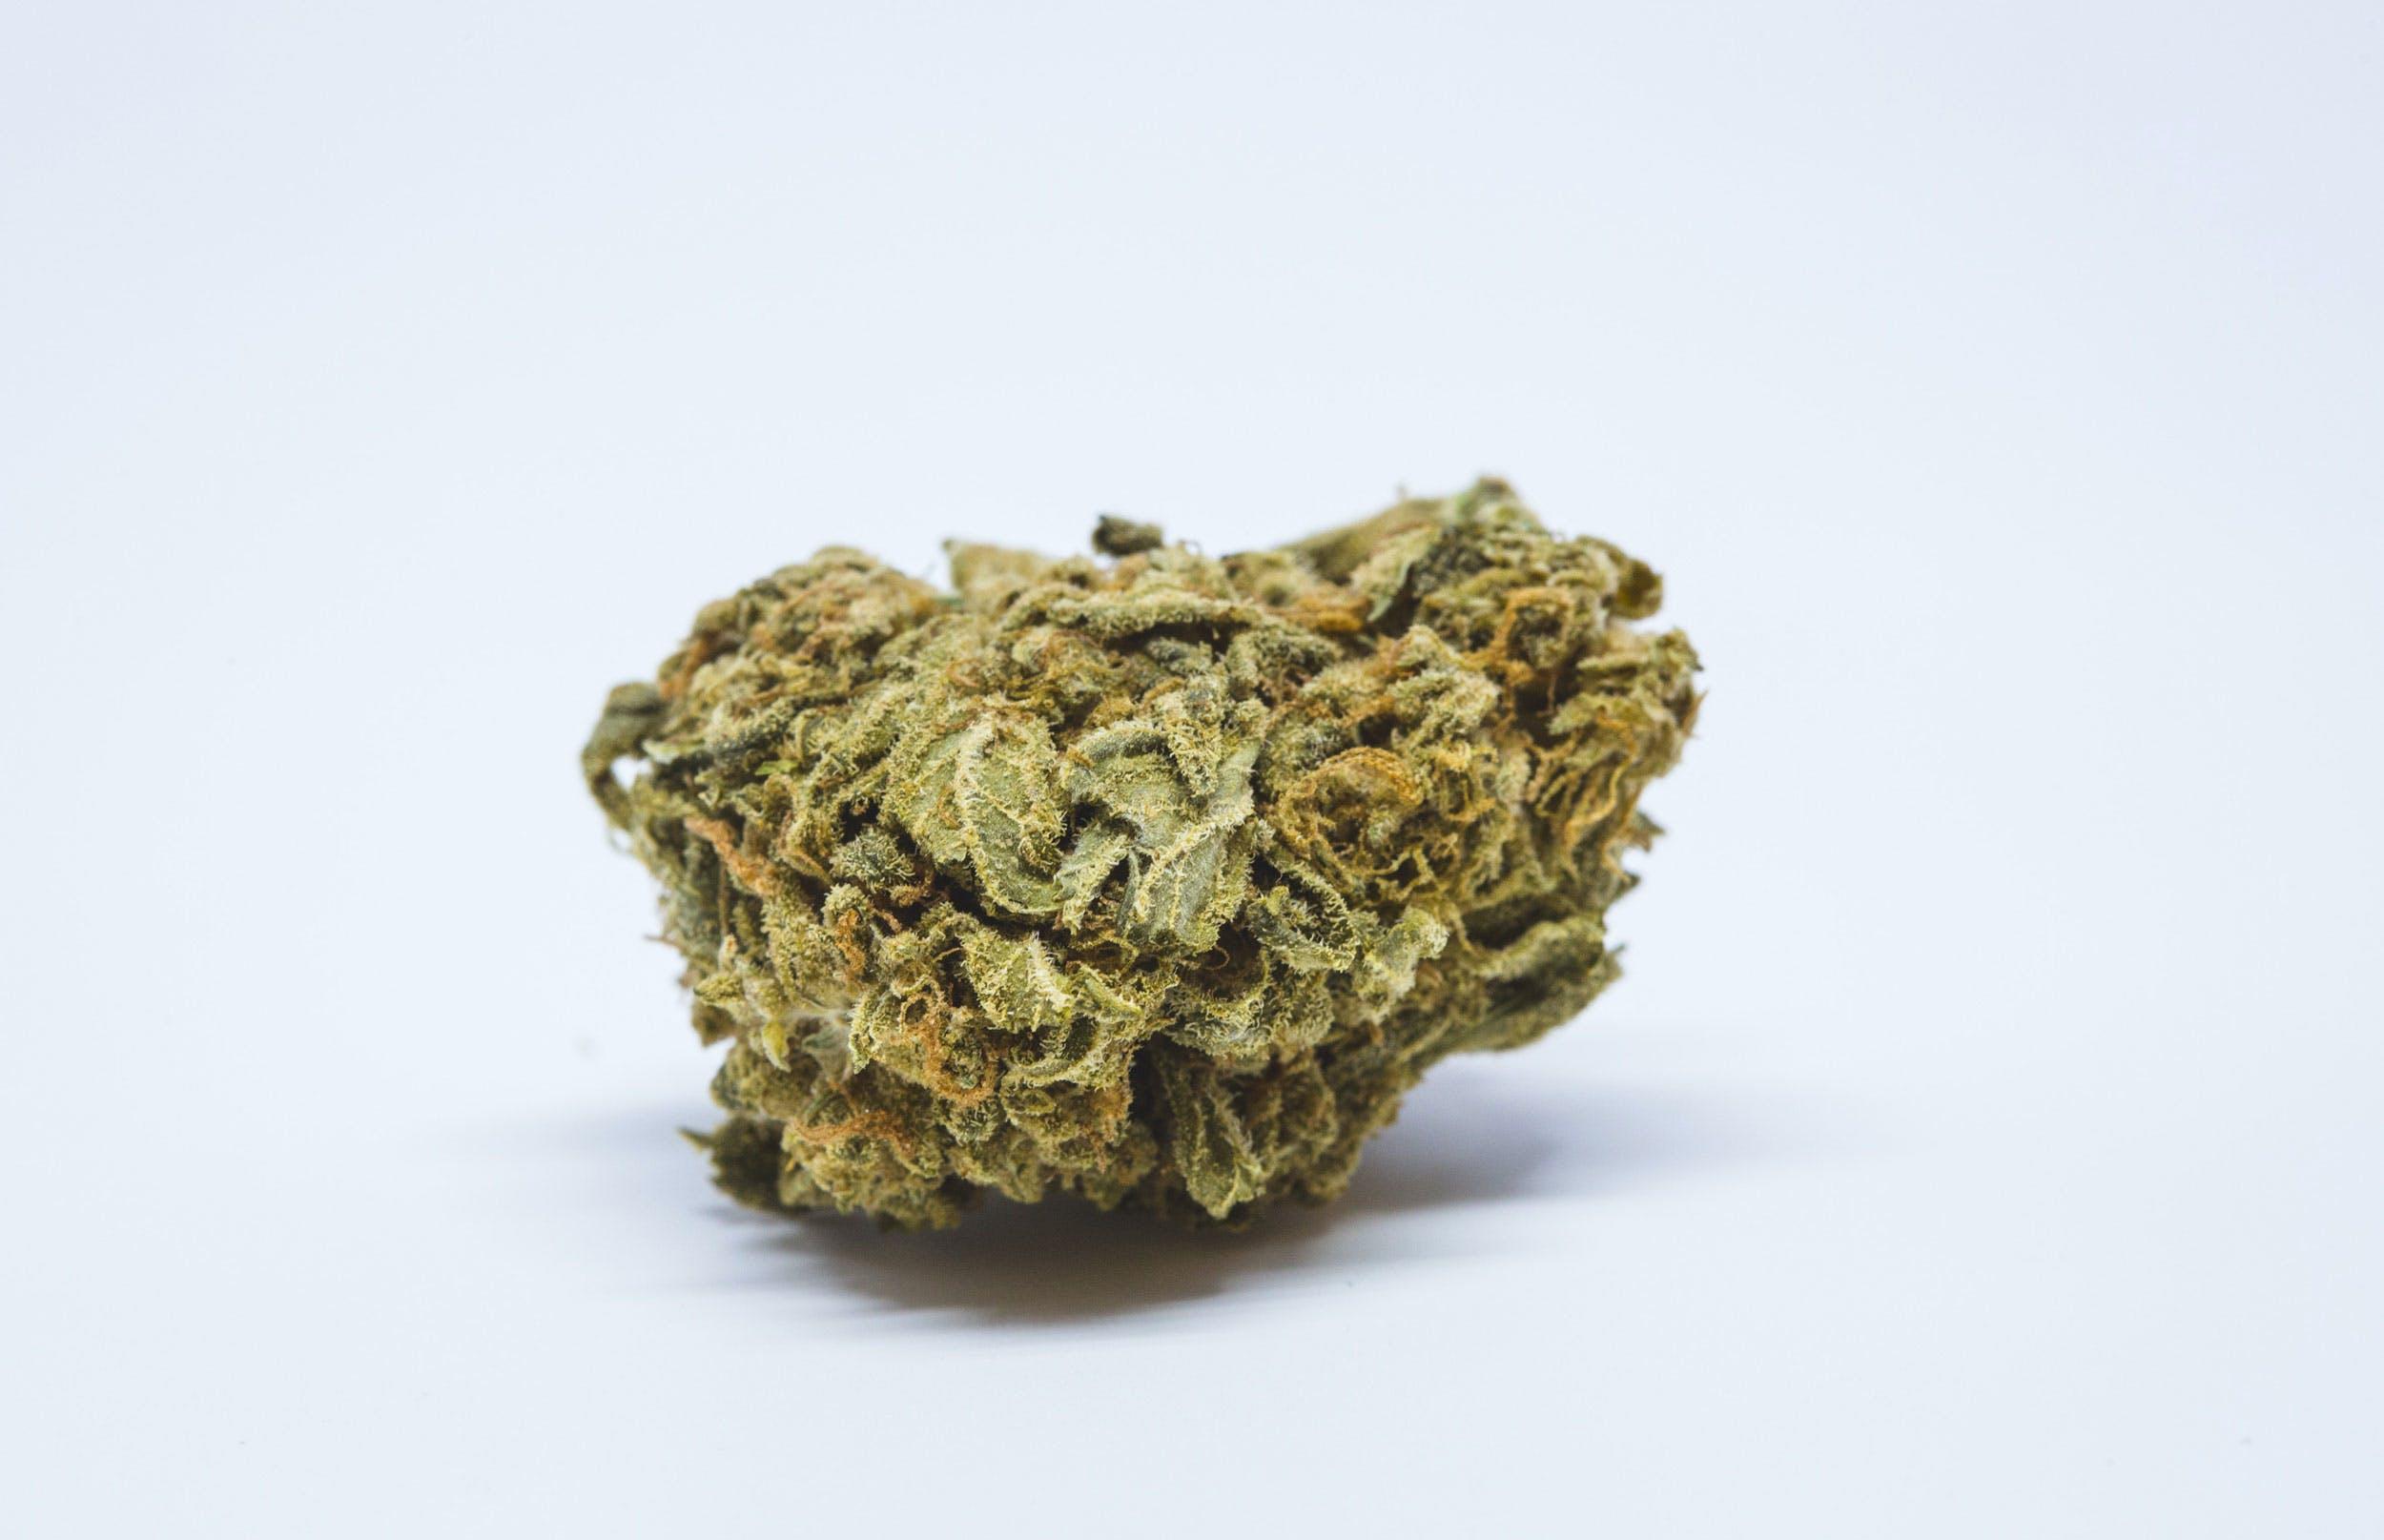 Thin Mint Girl Scout Cookies Hybrid Marijuana Strain 7 New Ways Cannabis Will Dominate Your Wellness Regime